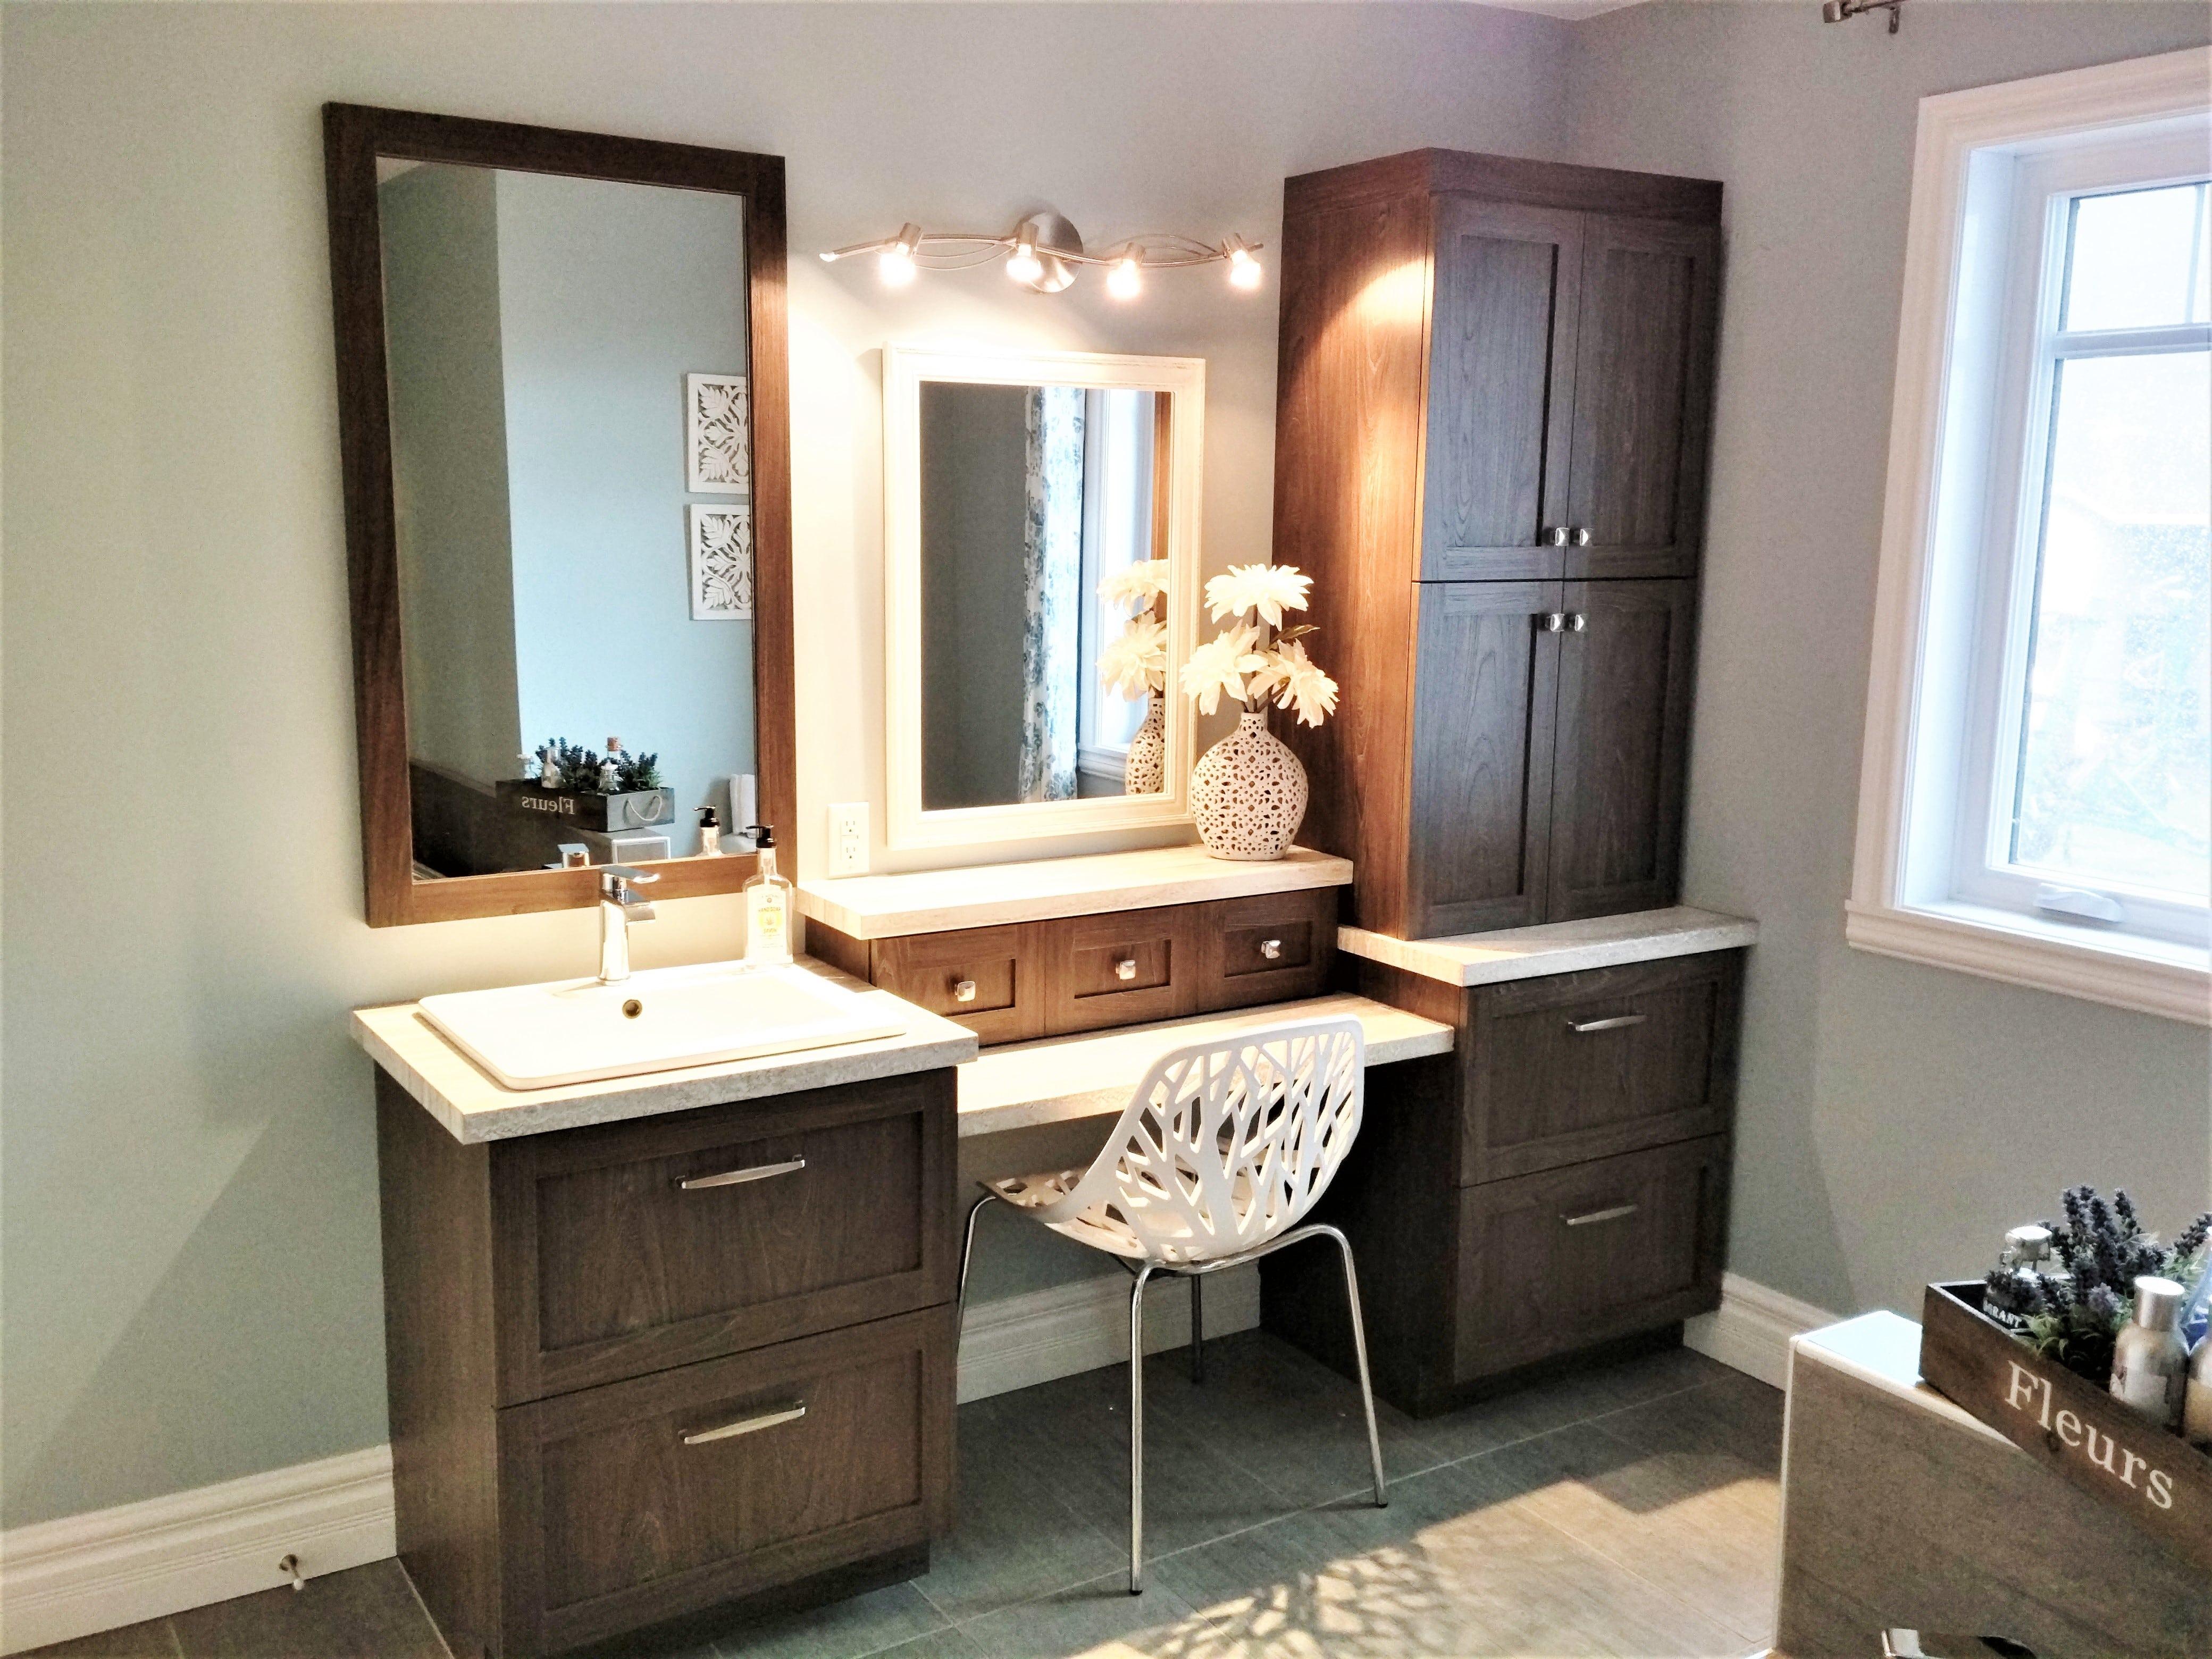 5. Vanité de salle de bain polyester